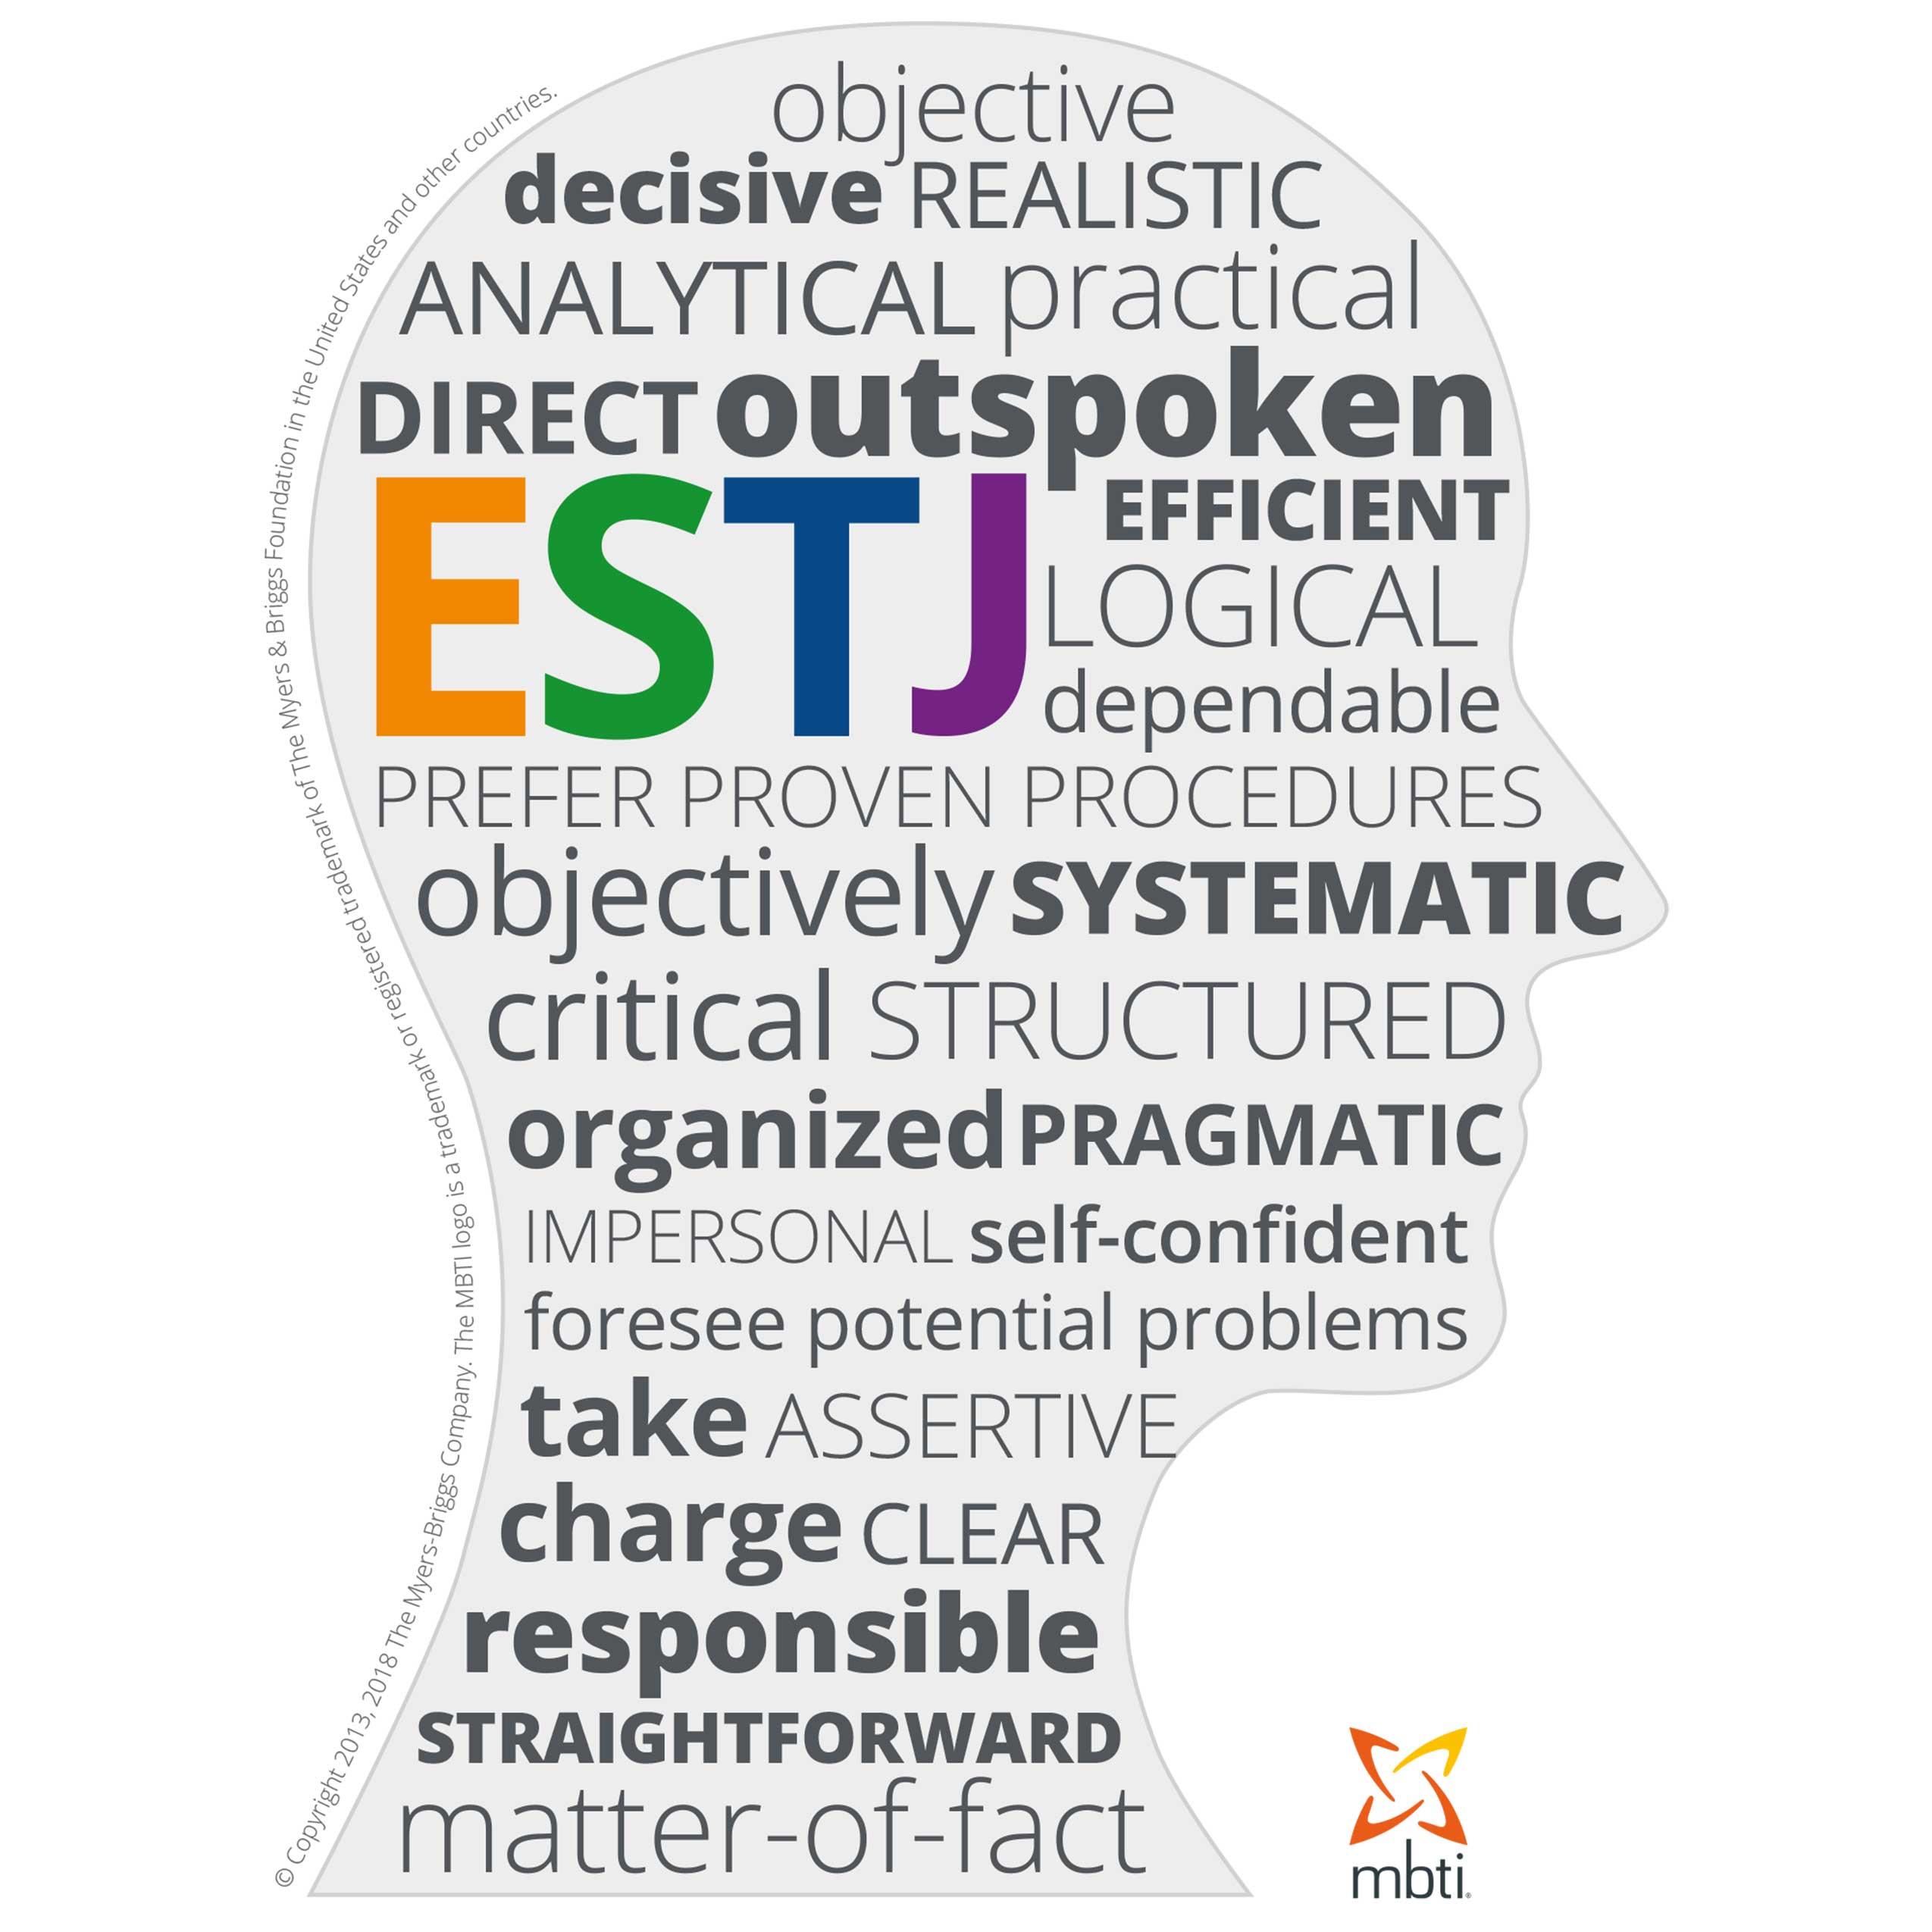 Typical characteristics of an ESTJ